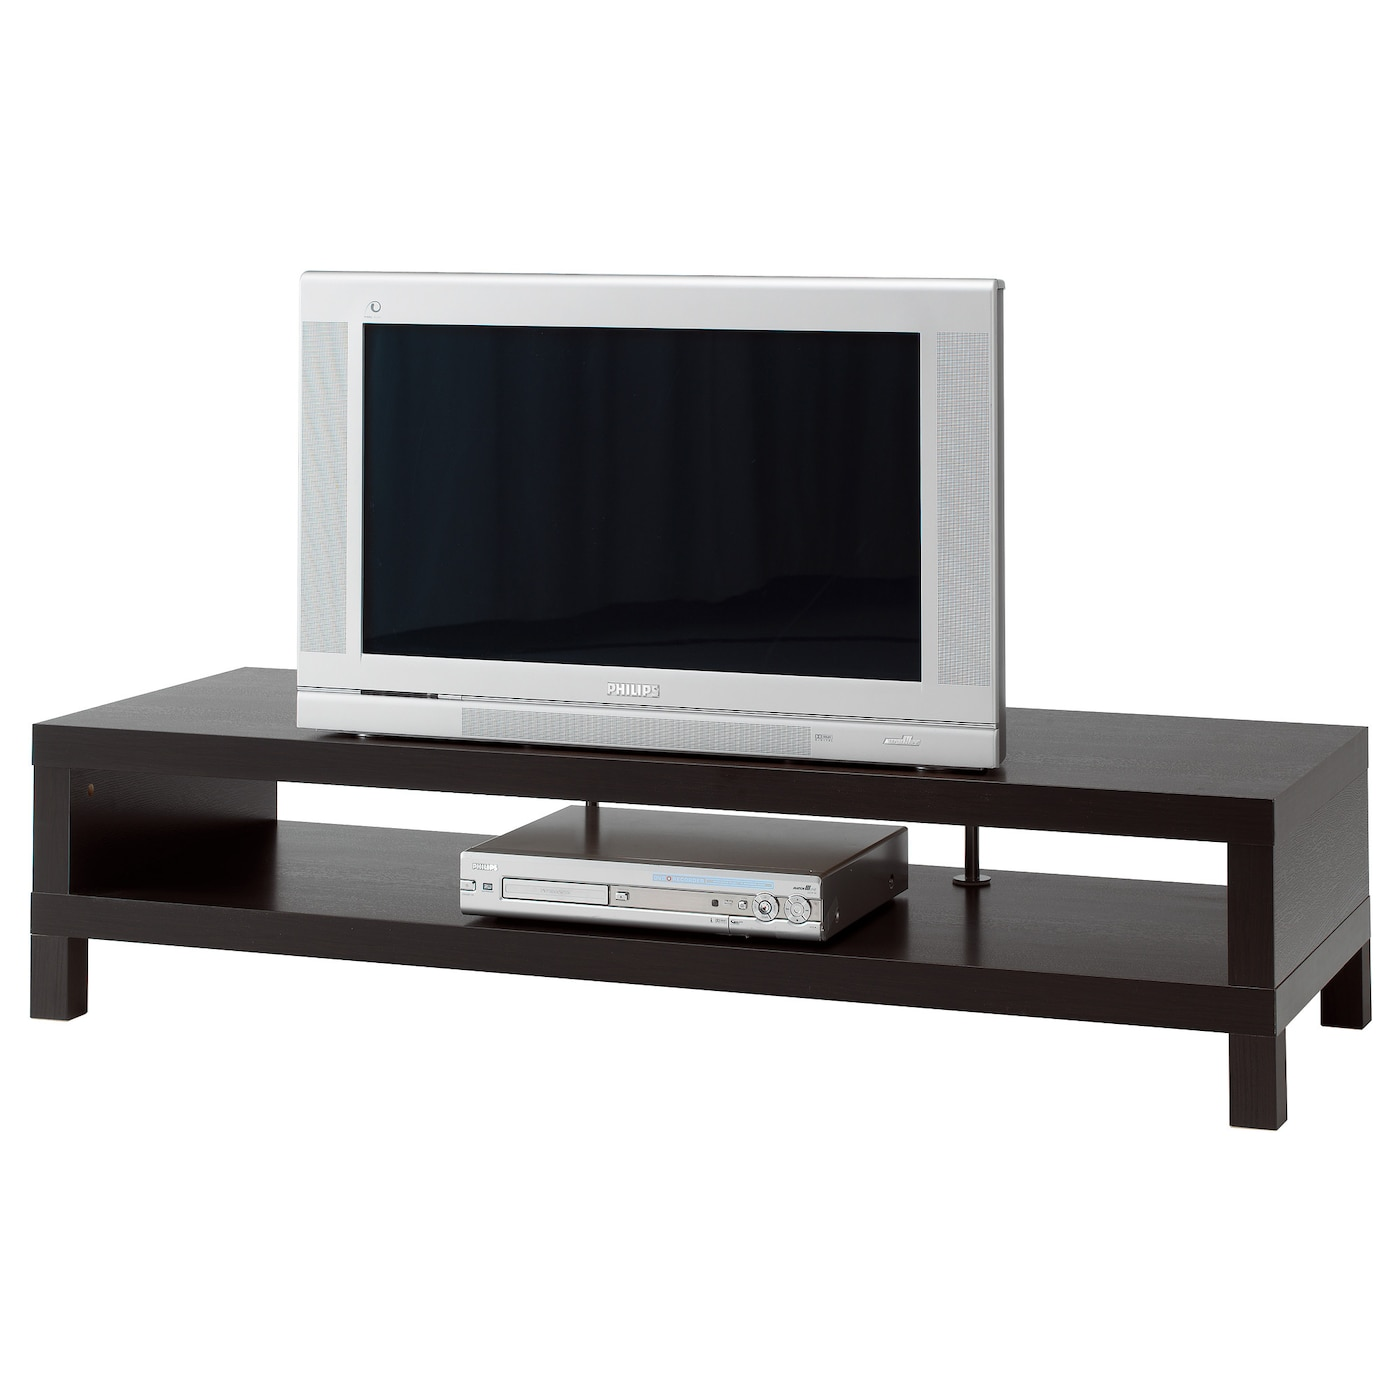 Lack Banc Tv Brun Noir 149×55 Cm Ikea # Ikea Meuble Tv Wenge